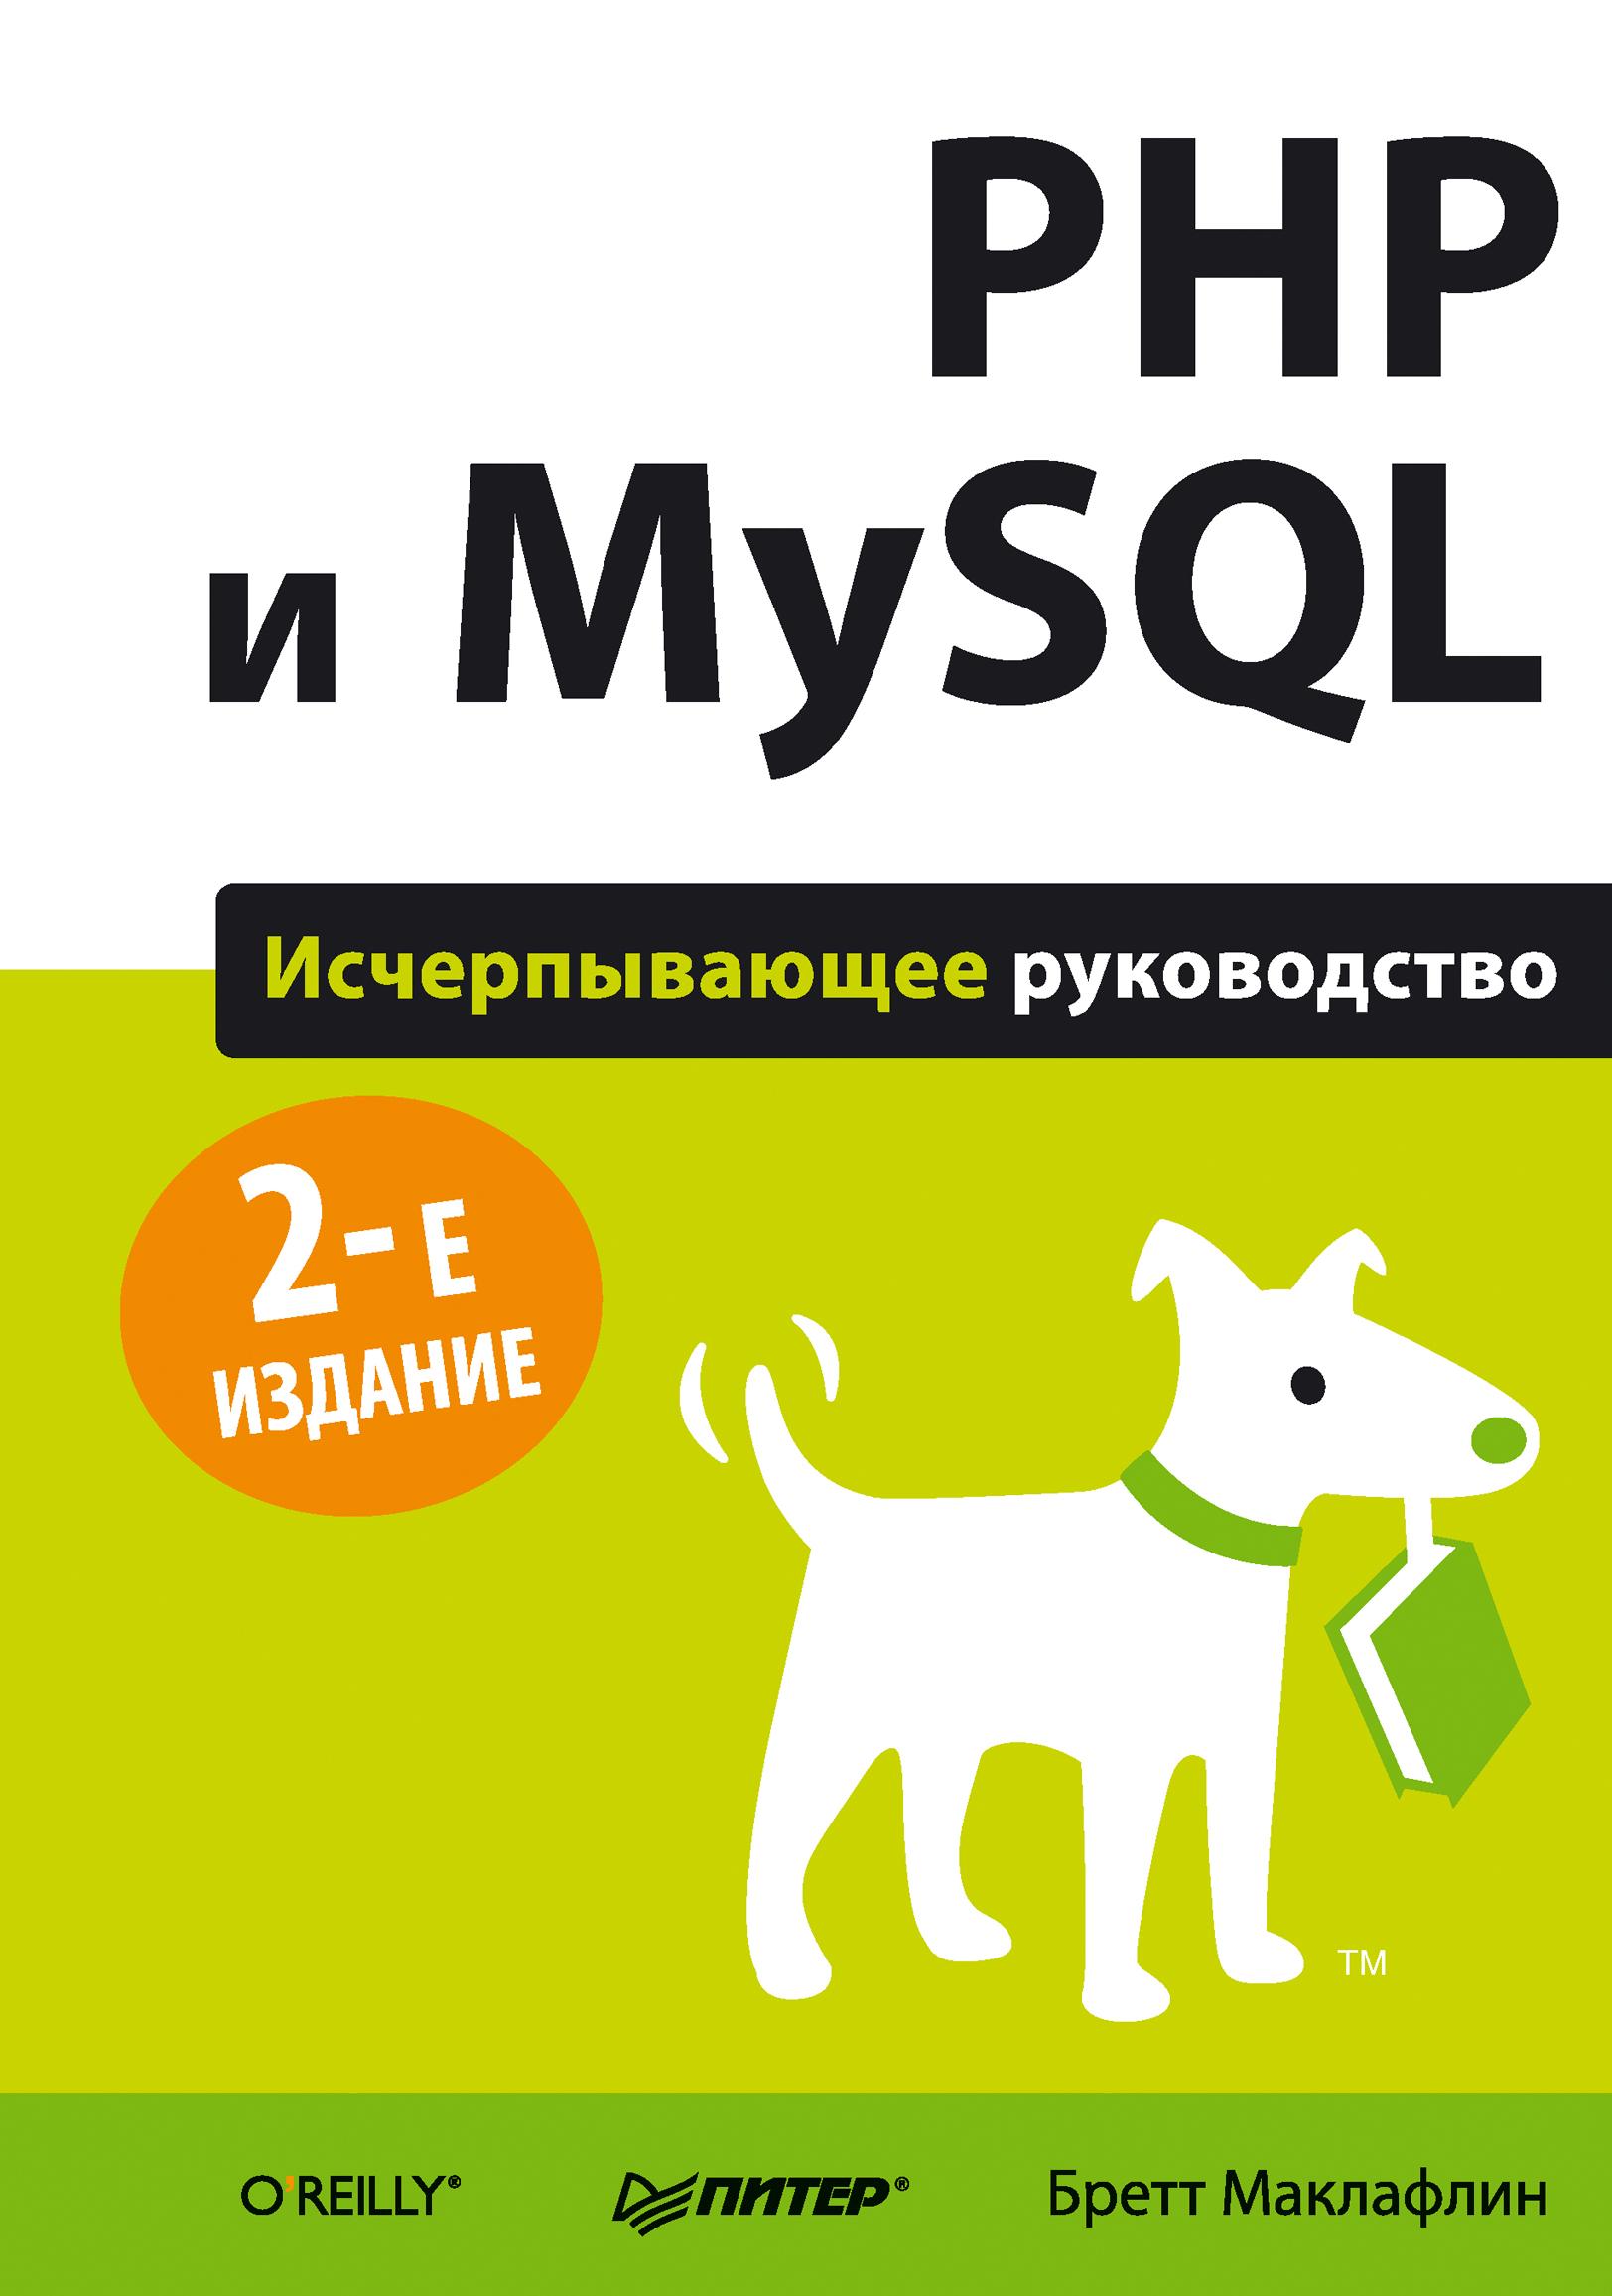 Бретт Маклафлин «PHP и MySQL Исчерпывающее руководство»